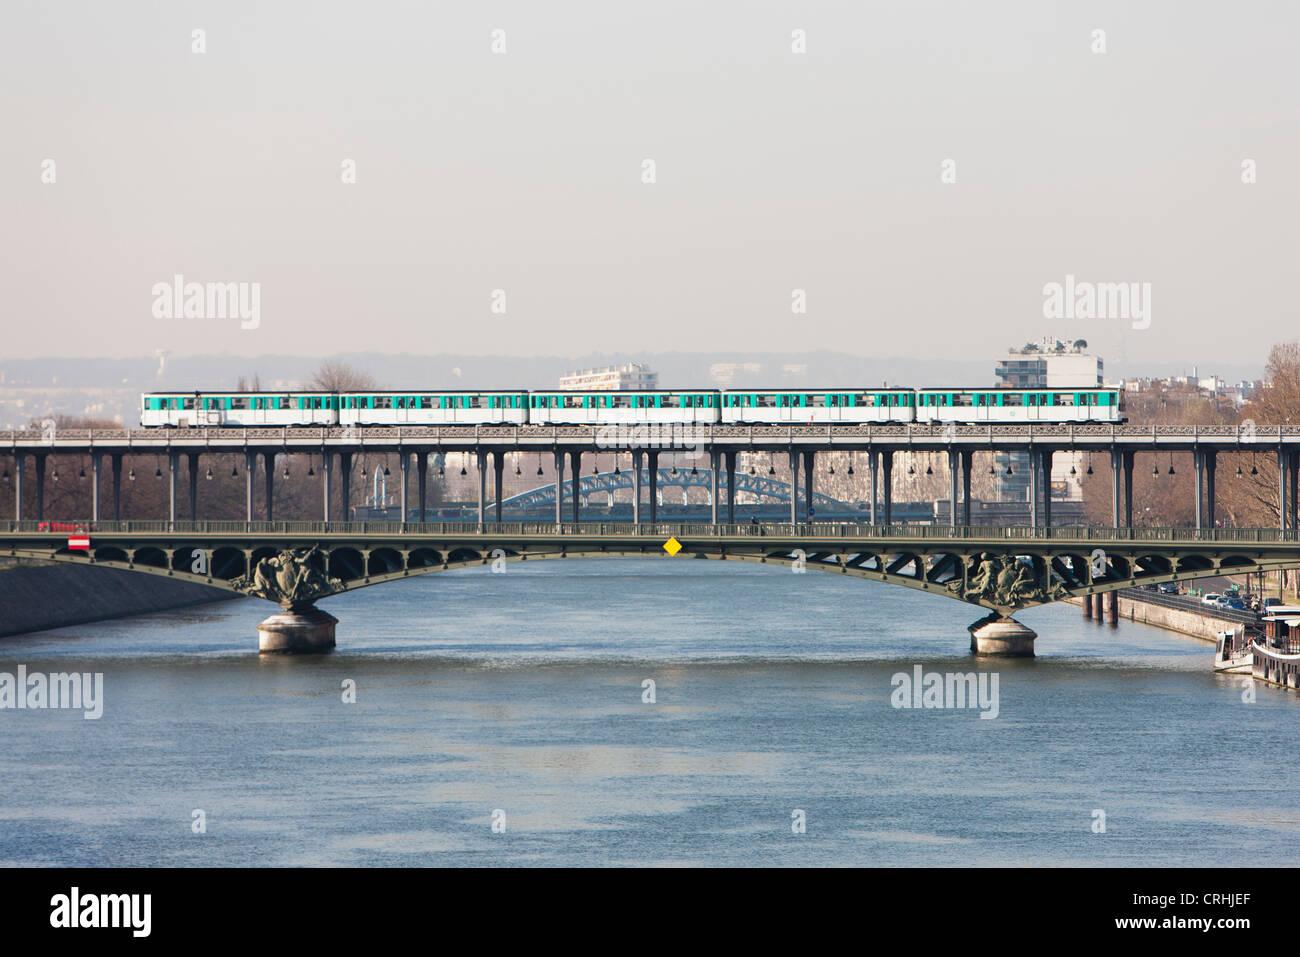 Paris metro crossing Pont de Bir-Hakeim, Paris, France - Stock Image